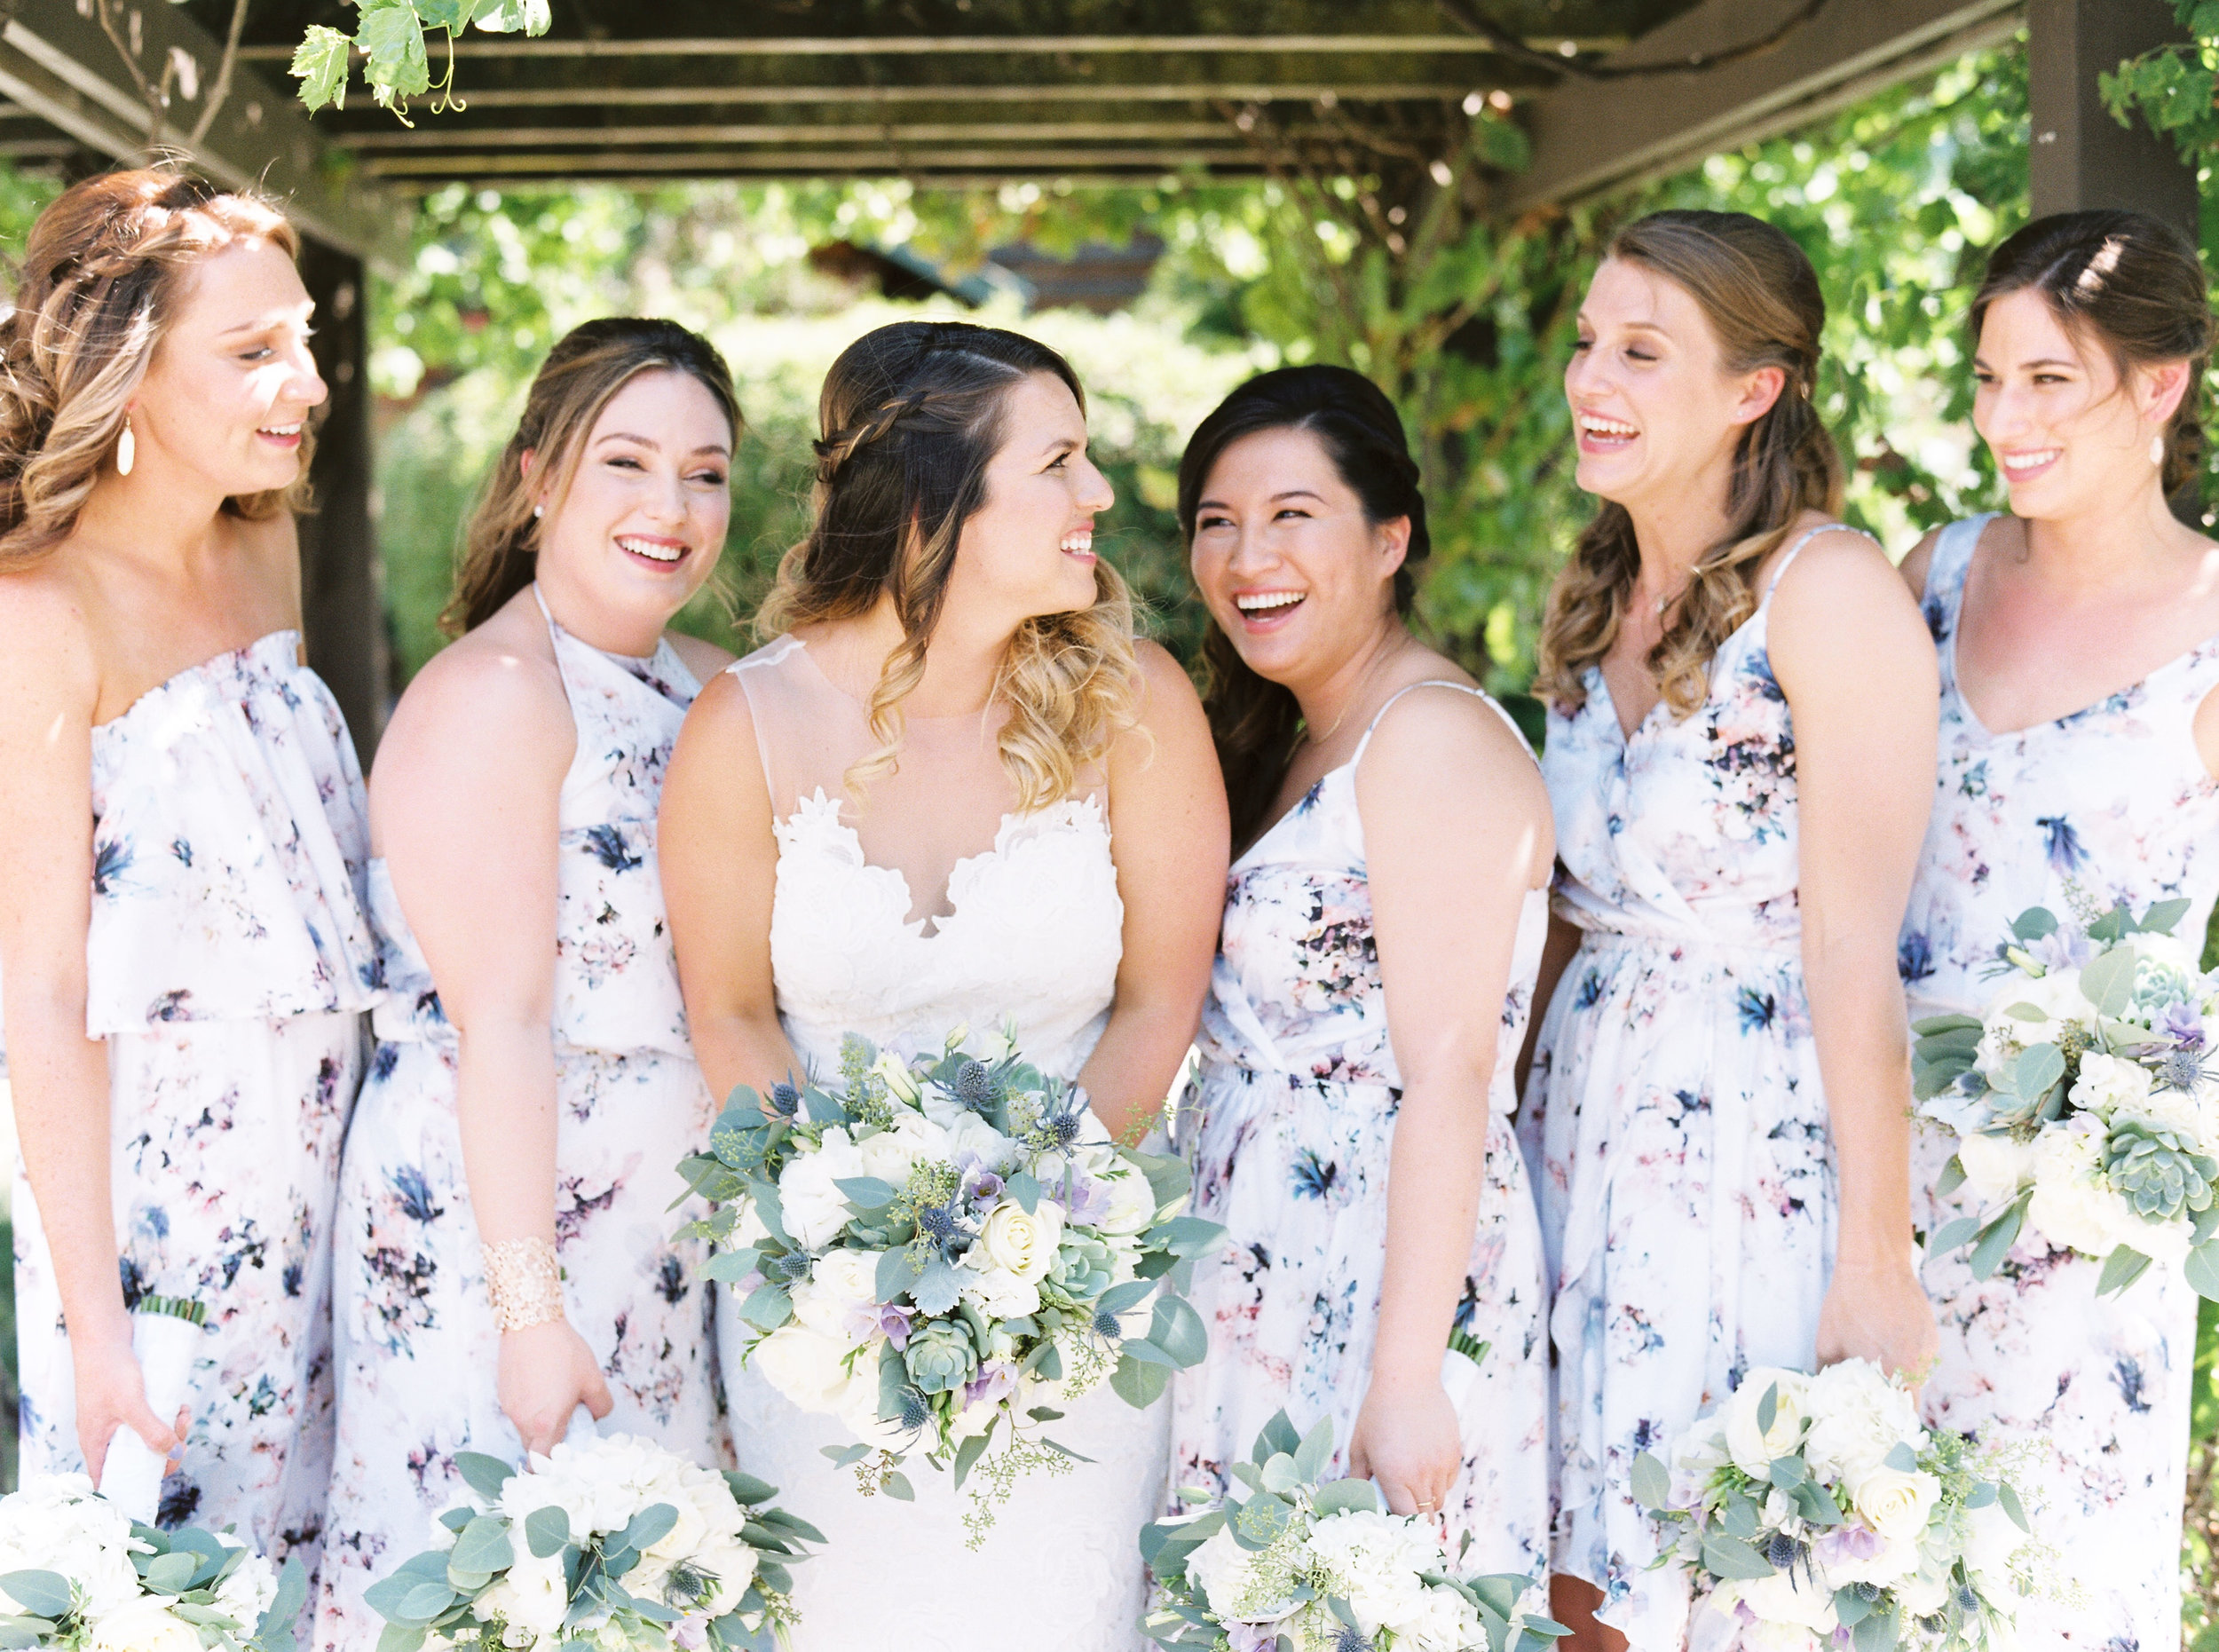 the-purple-orchid-resort-wedding-in-livermore-california-206.jpg